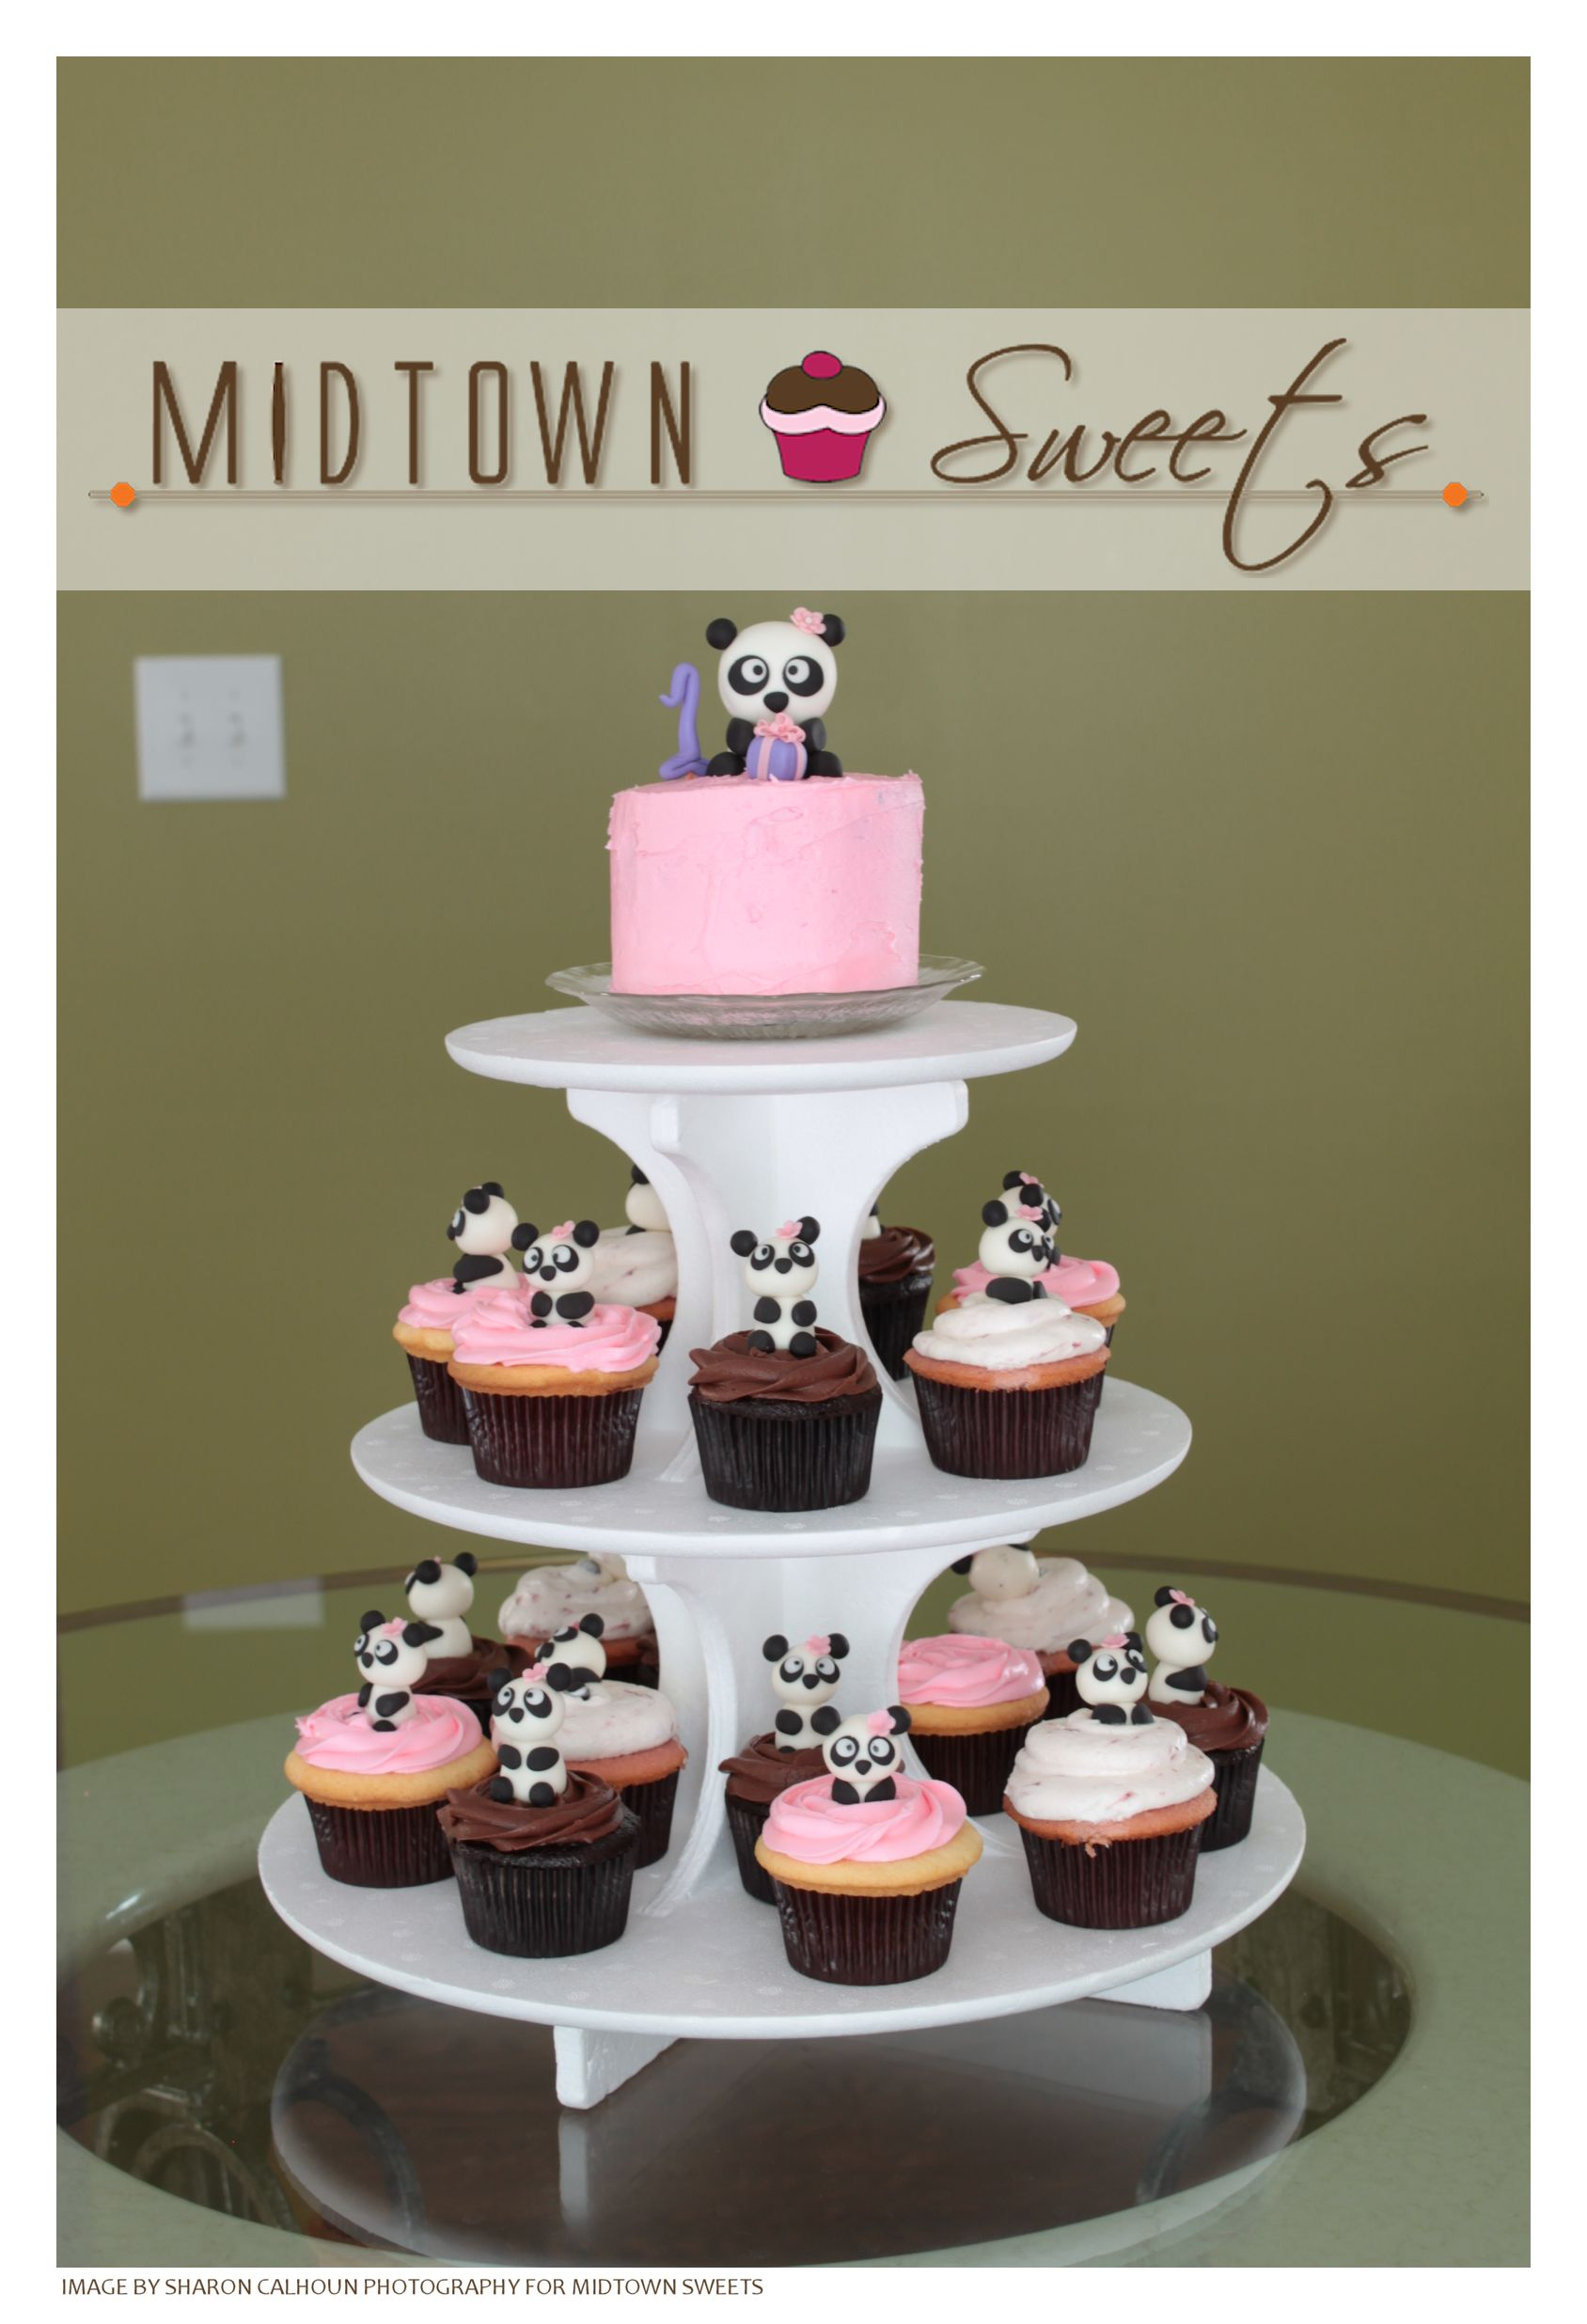 Midtown Sweets  Panda Cupcakes  Smash Cake